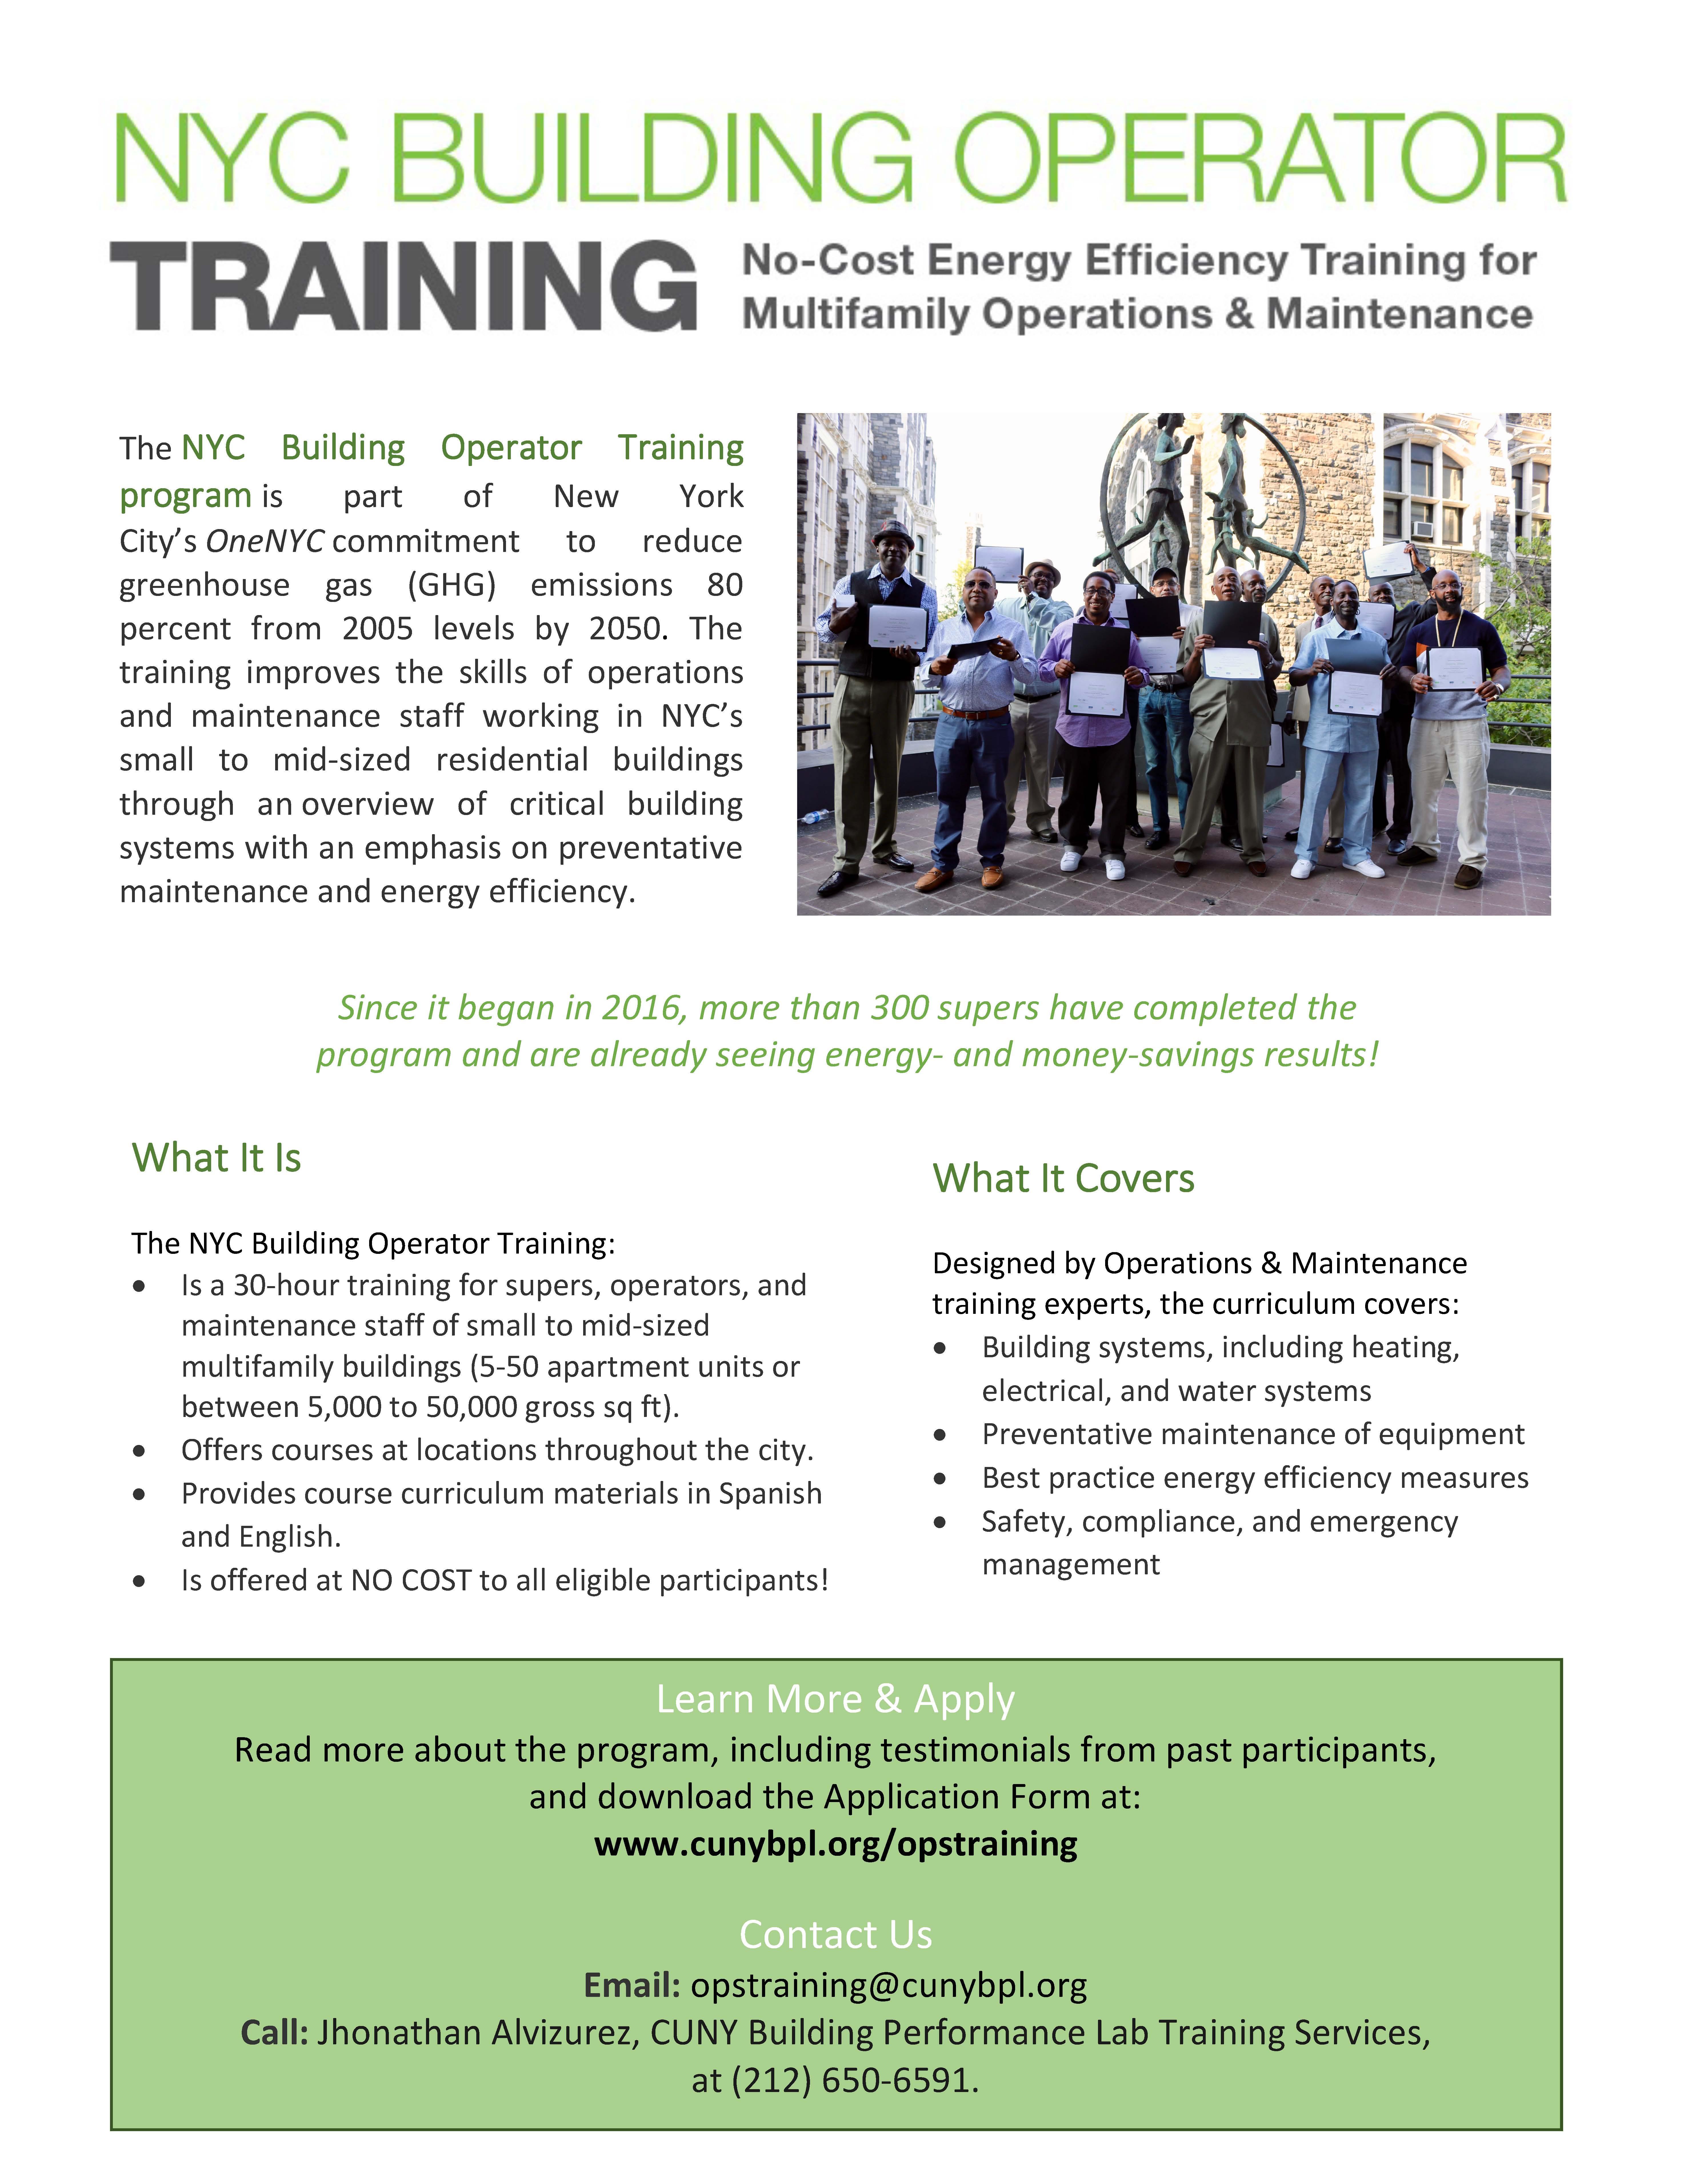 NYC Building Operator Training